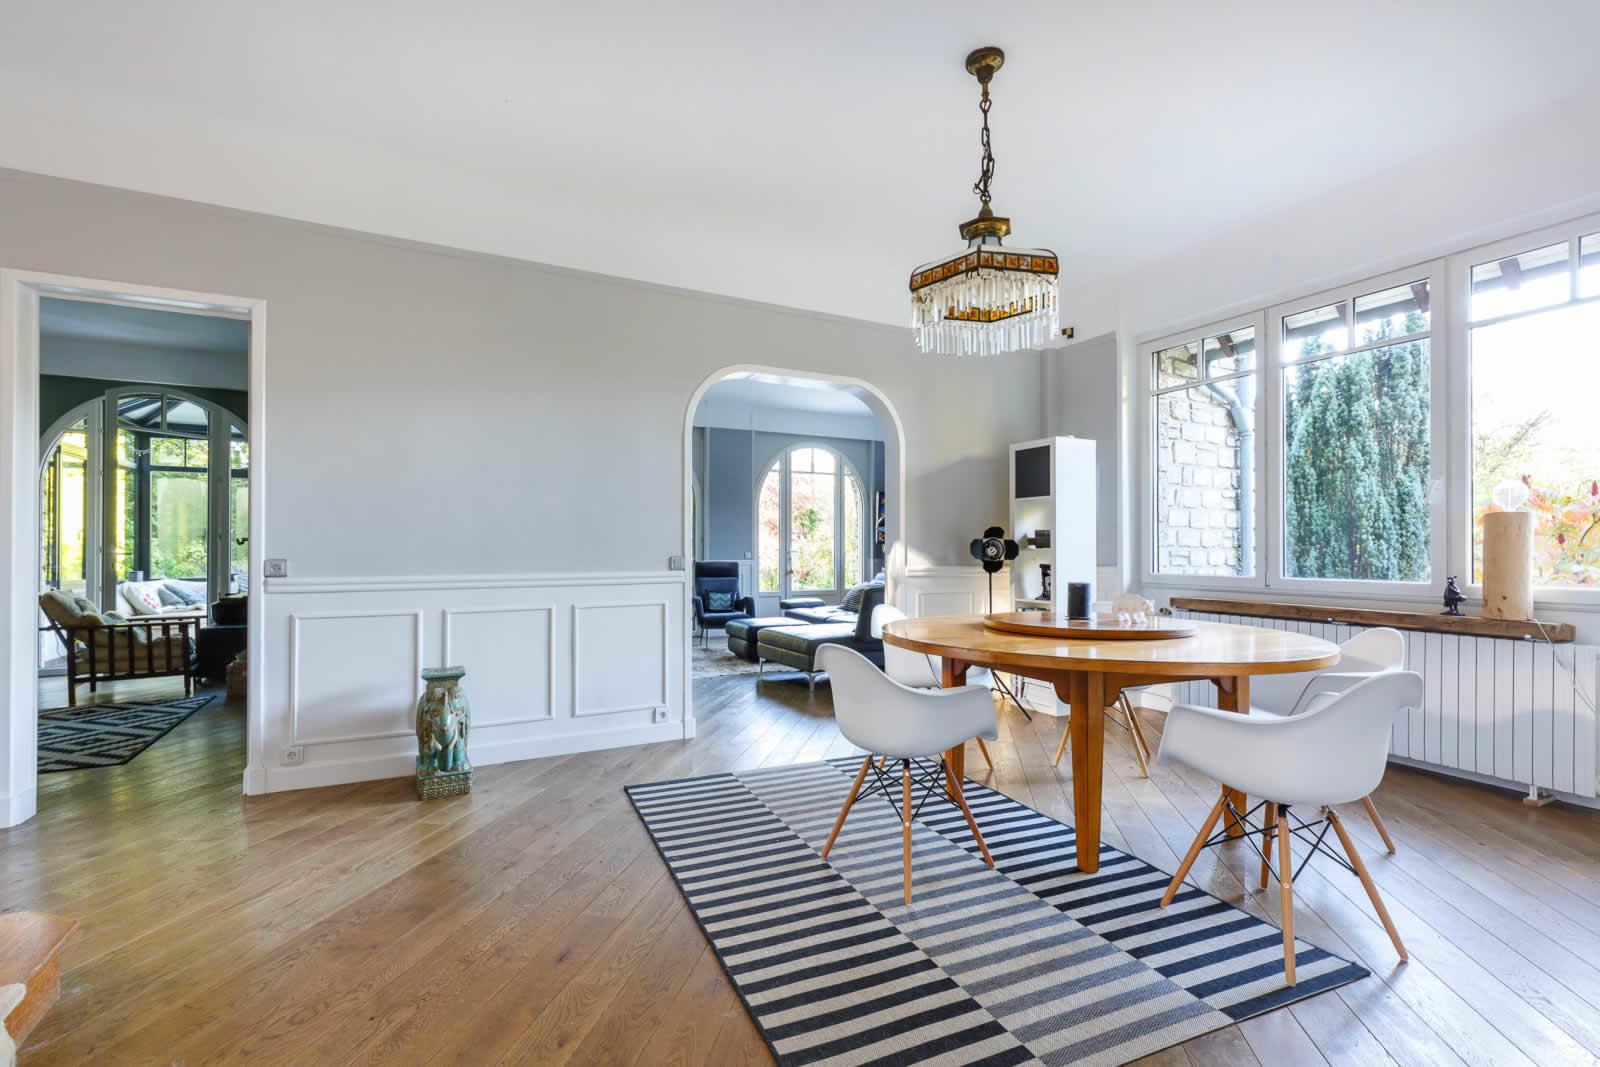 maison-familiale-a-vendre-marly-le-roi-parc-veranda-terrasse-cave-garage